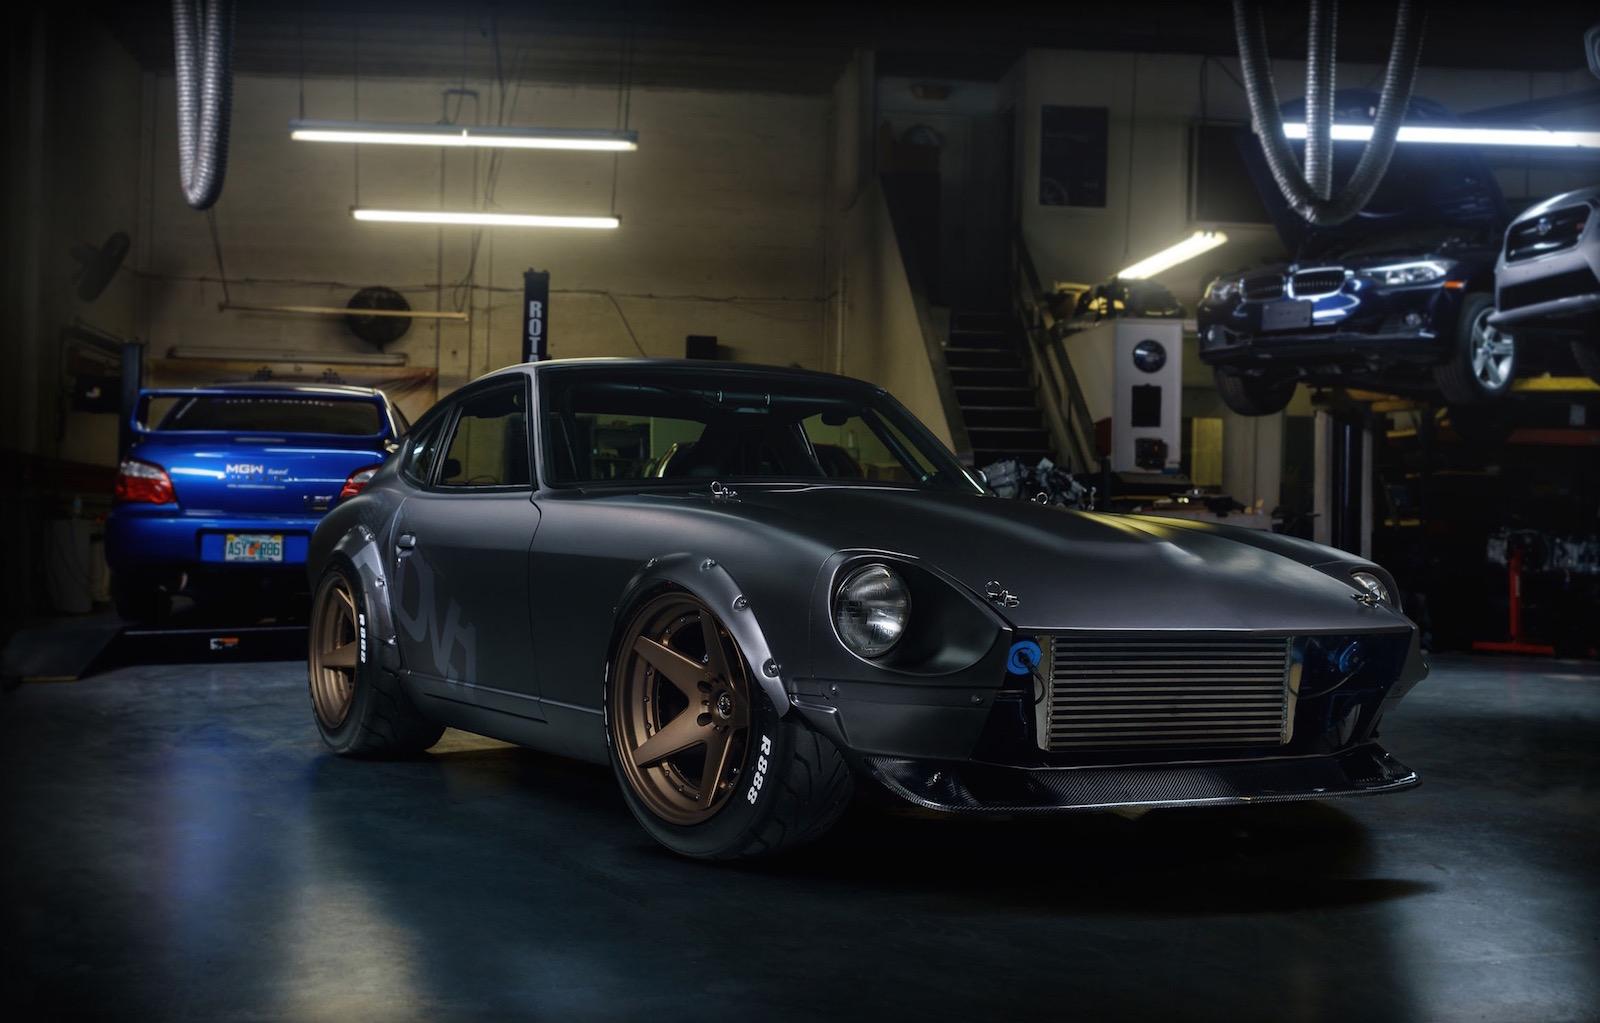 Adv 1 Datsun 280z Gets Mean 2jz Engine Conversion Video